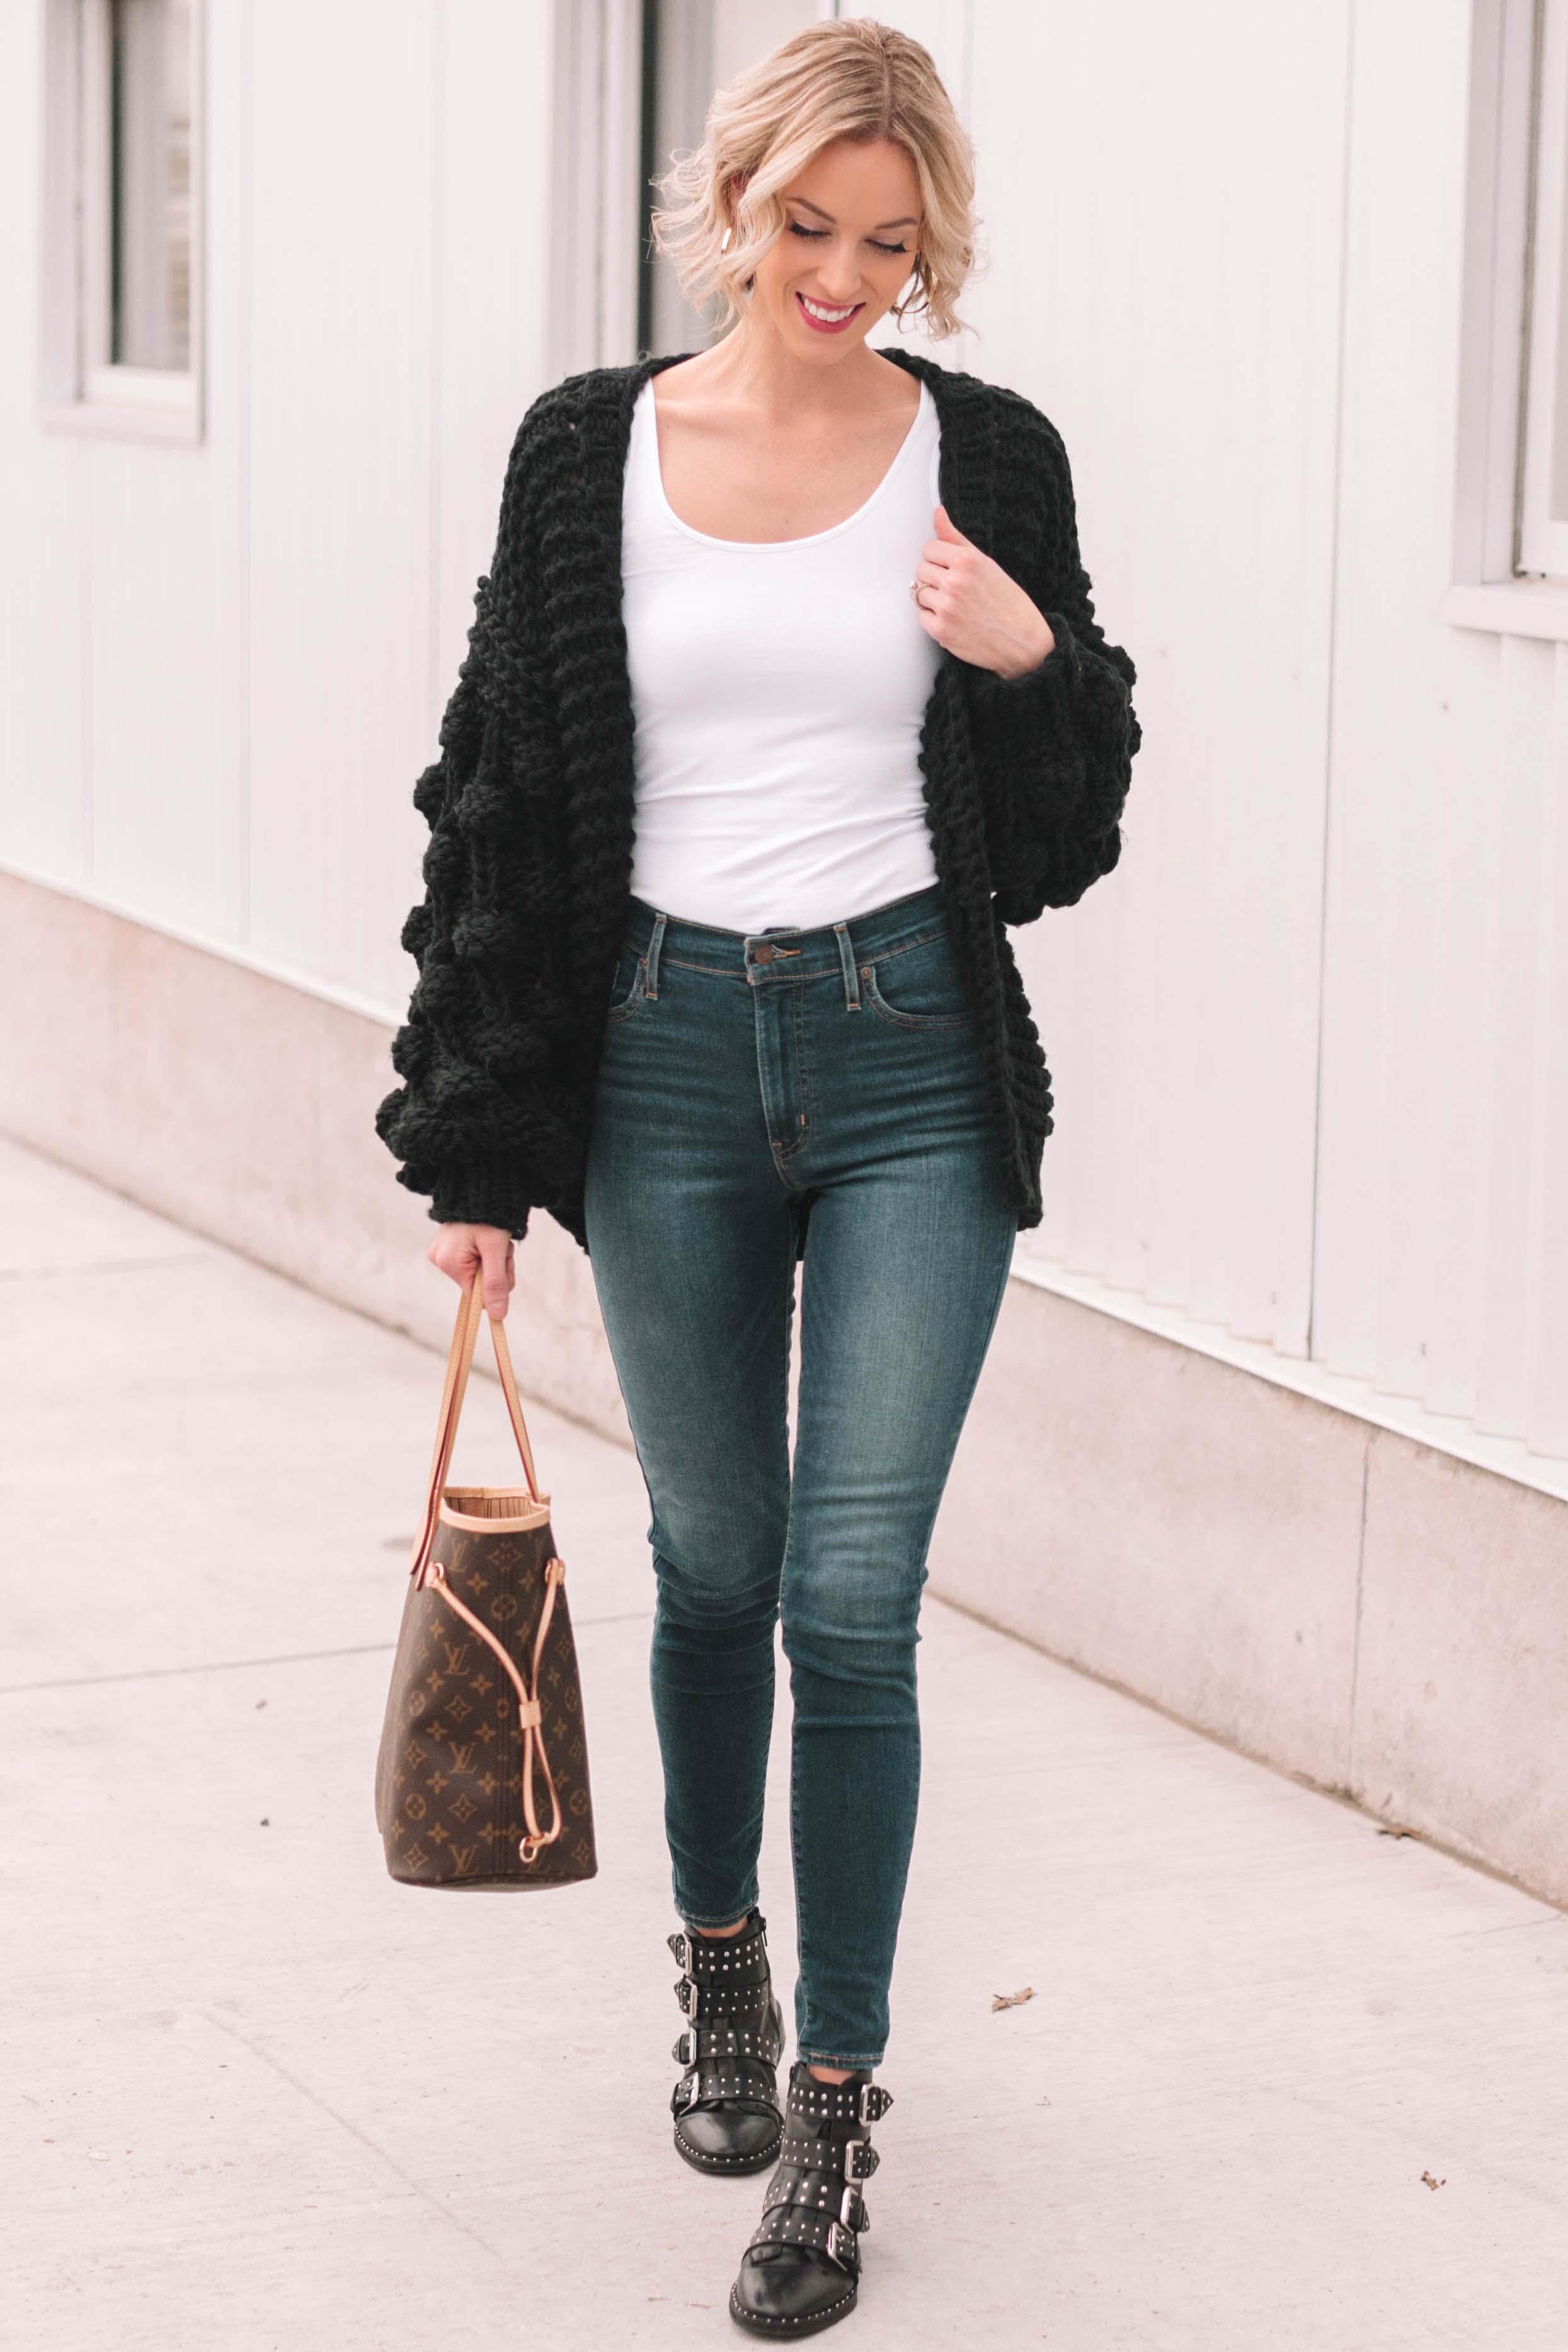 Chunky Black Cardigan - Straight A Style